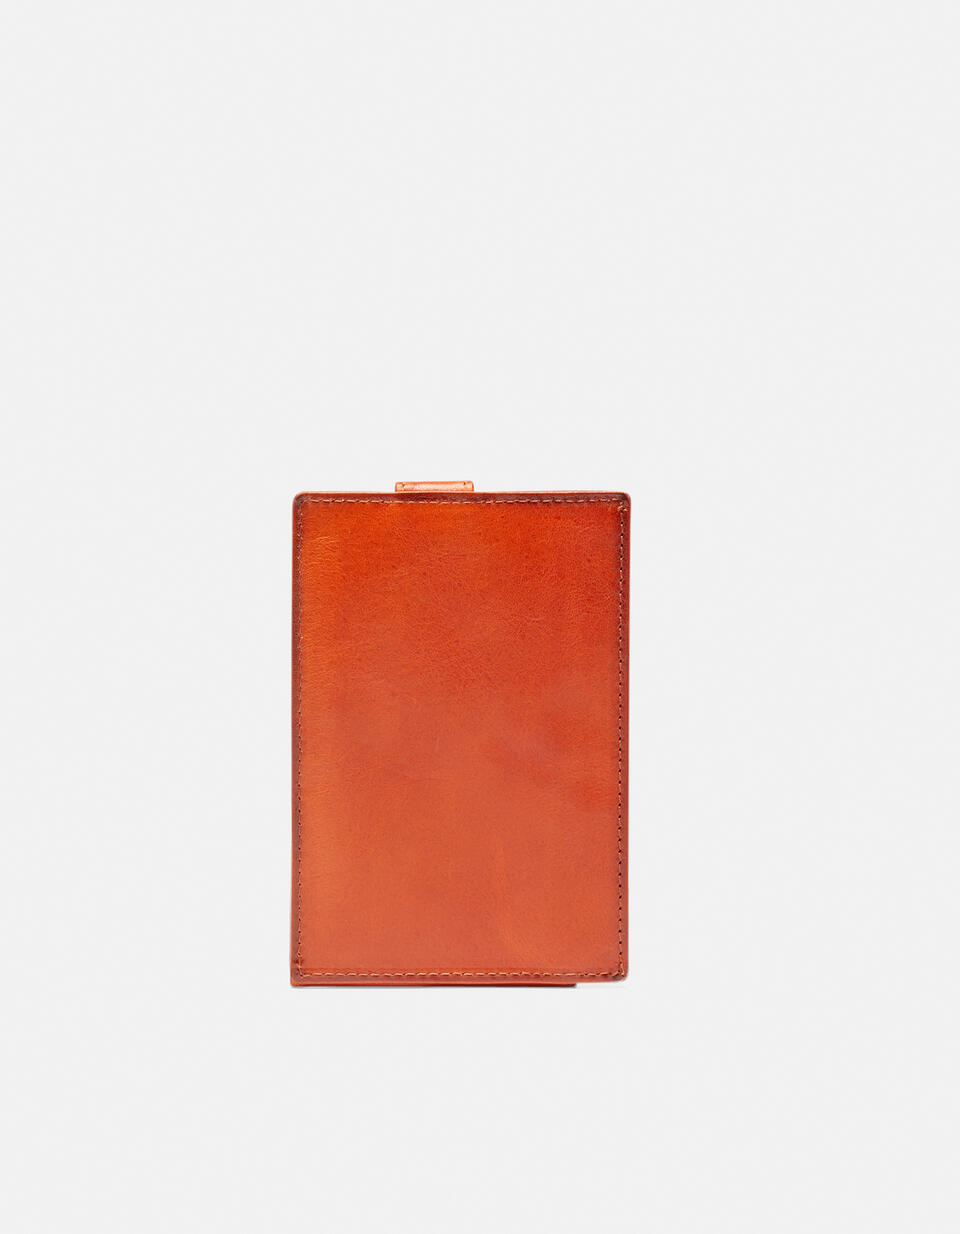 Warm and Color Anti-RFID cardholder ARANCIO Cuoieria Fiorentina